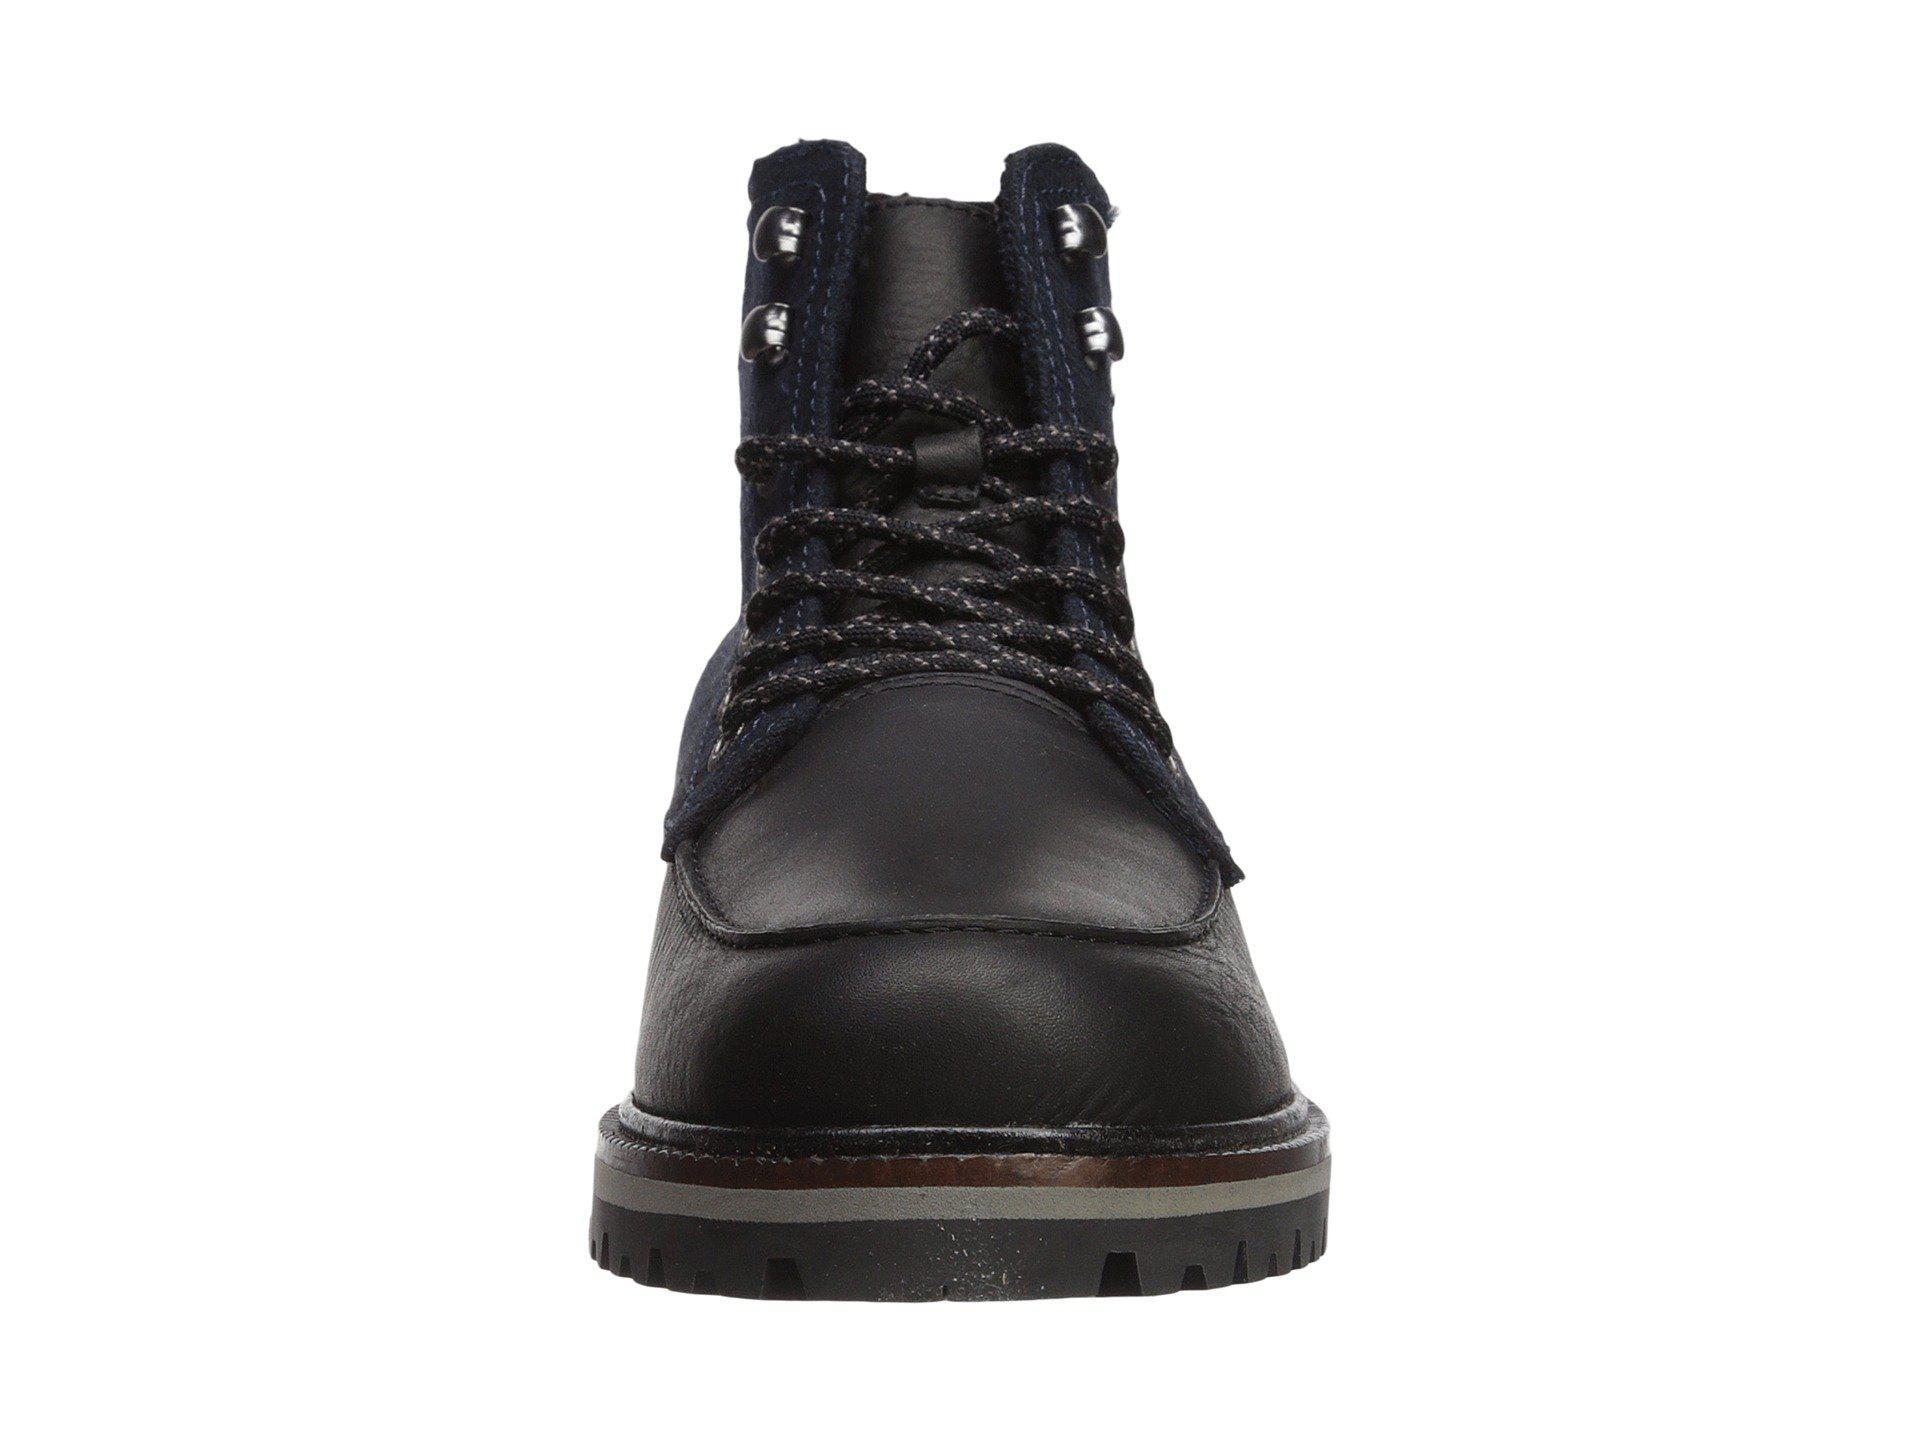 78bb5d531 Lacoste - Black Montbard Boot 417 1 Cam for Men - Lyst. View fullscreen